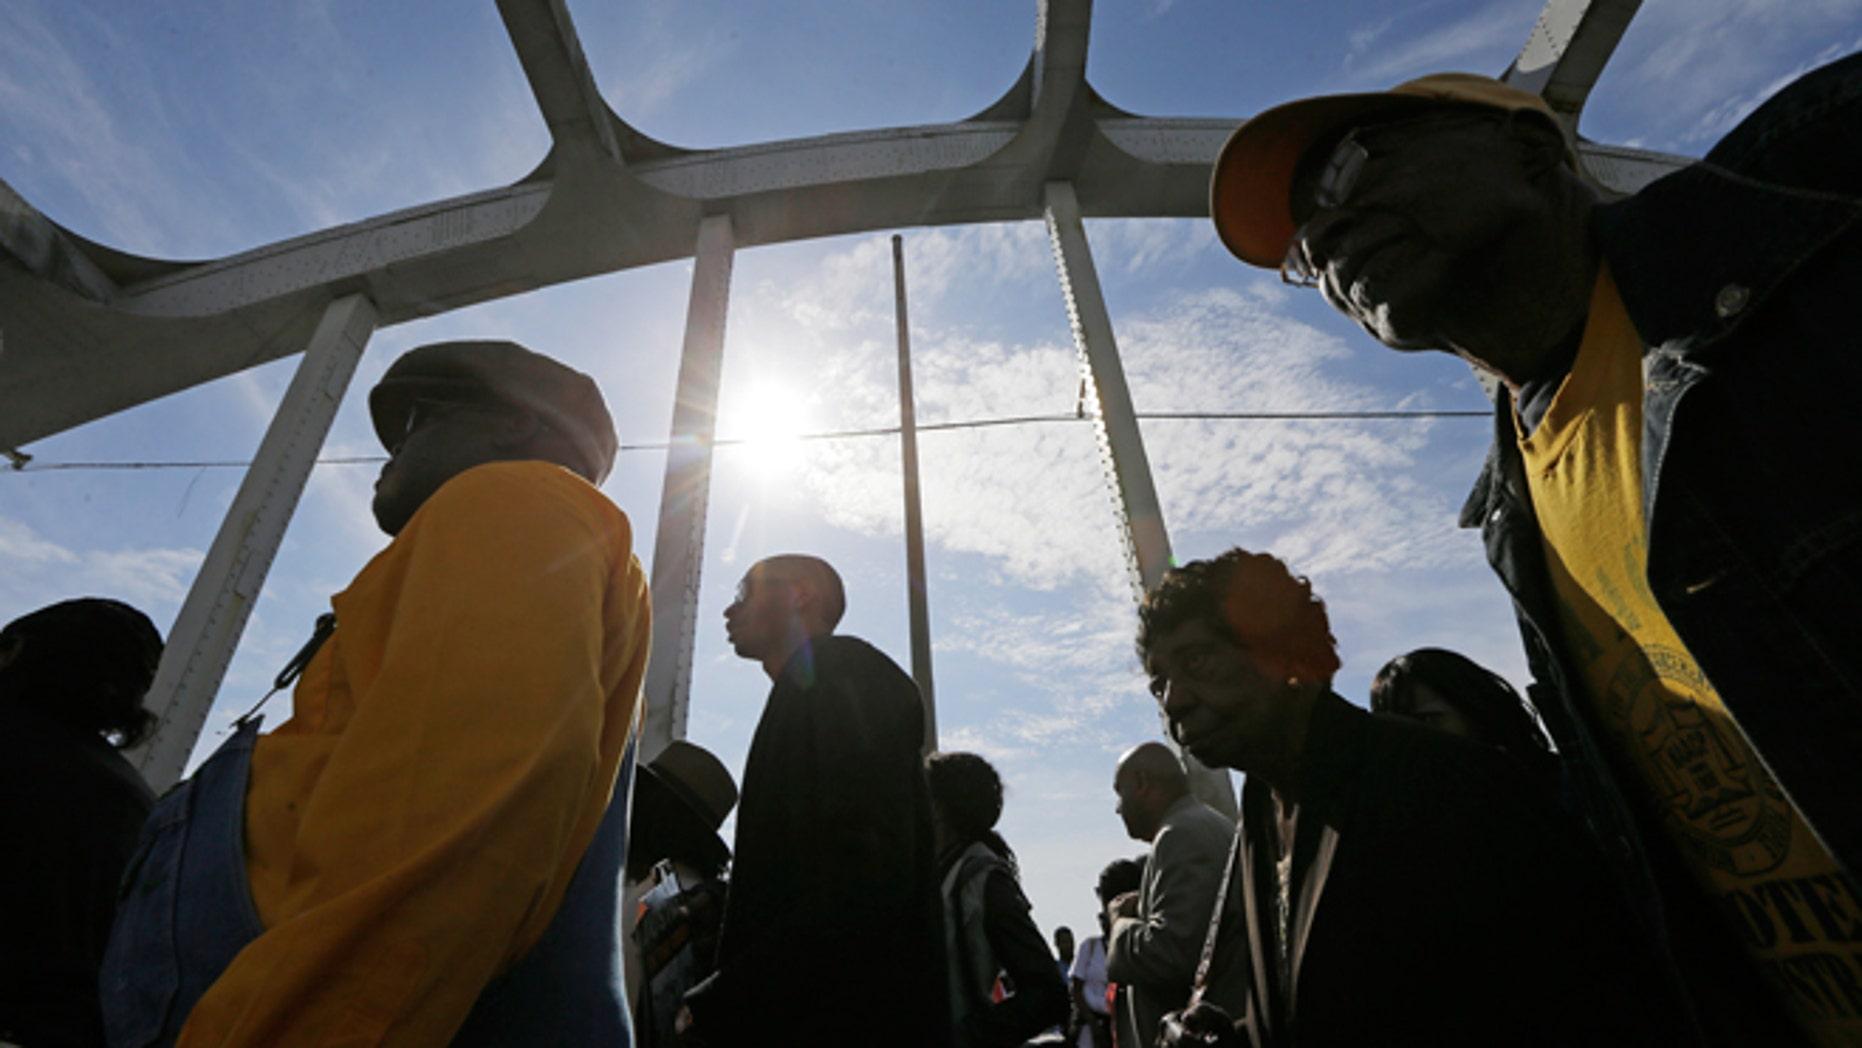 March 8, 2015: Crowds of people walk toward Selma after taking a symbolic walk across the Edmund Pettus Bridge in Selma, Ala.